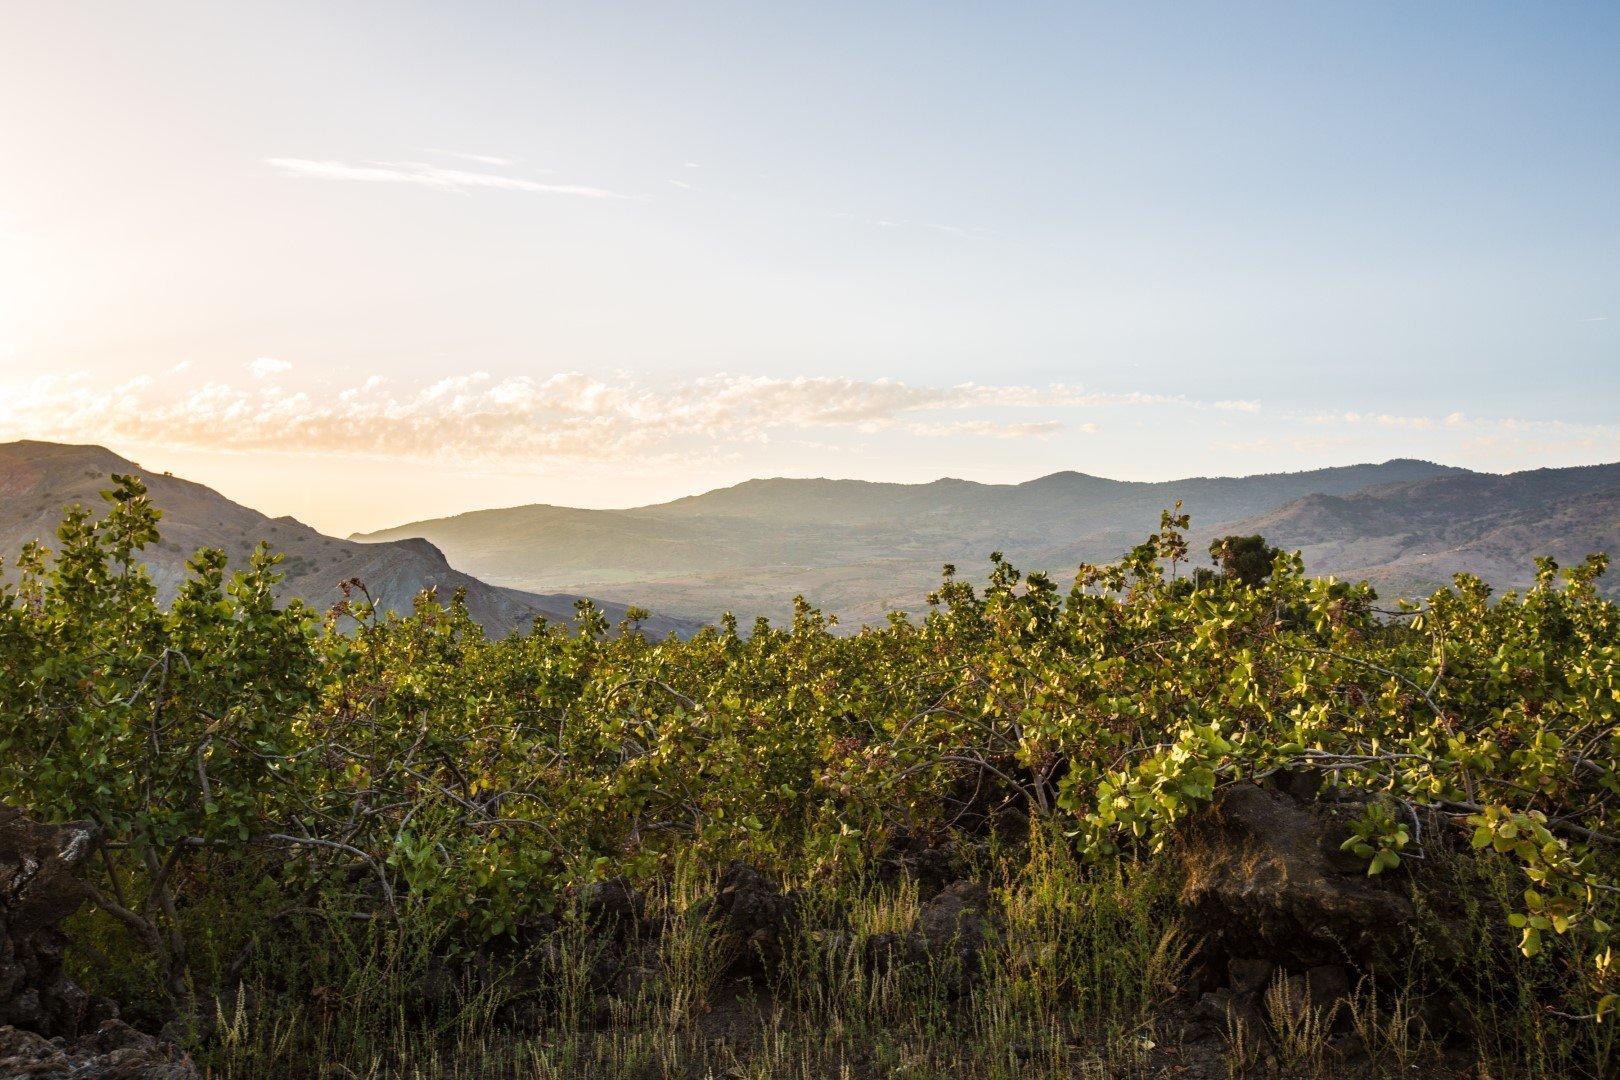 pistachio of Bronte: view on the pistachio trees